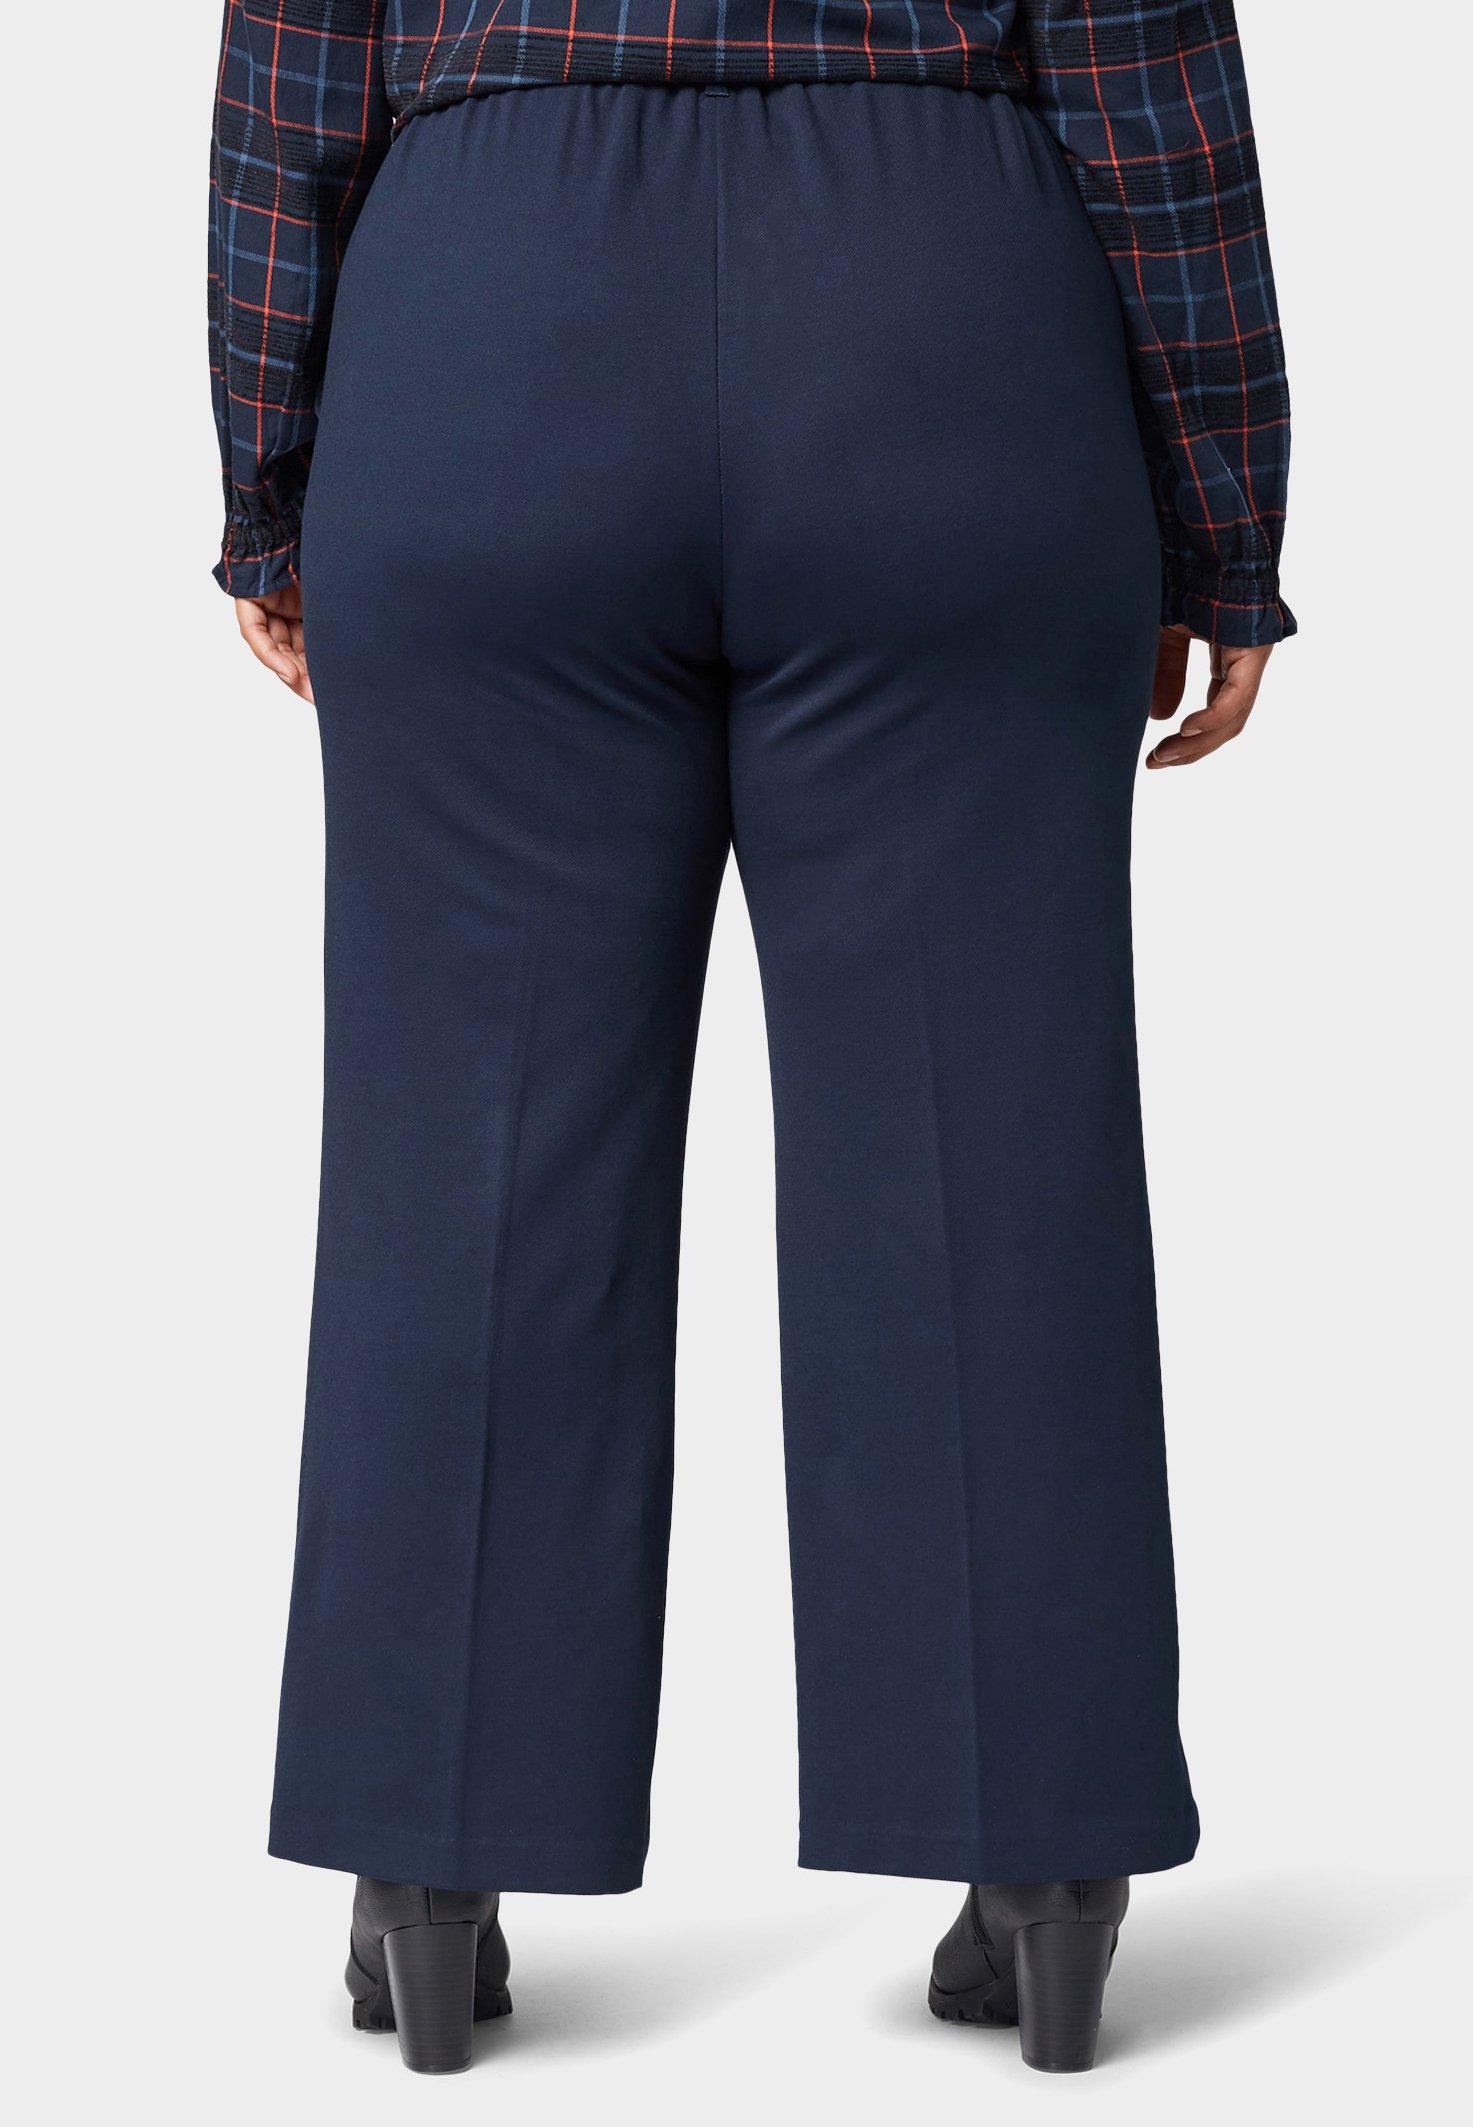 MY TRUE ME TOM TAILOR Pantalon classique sky captain blue